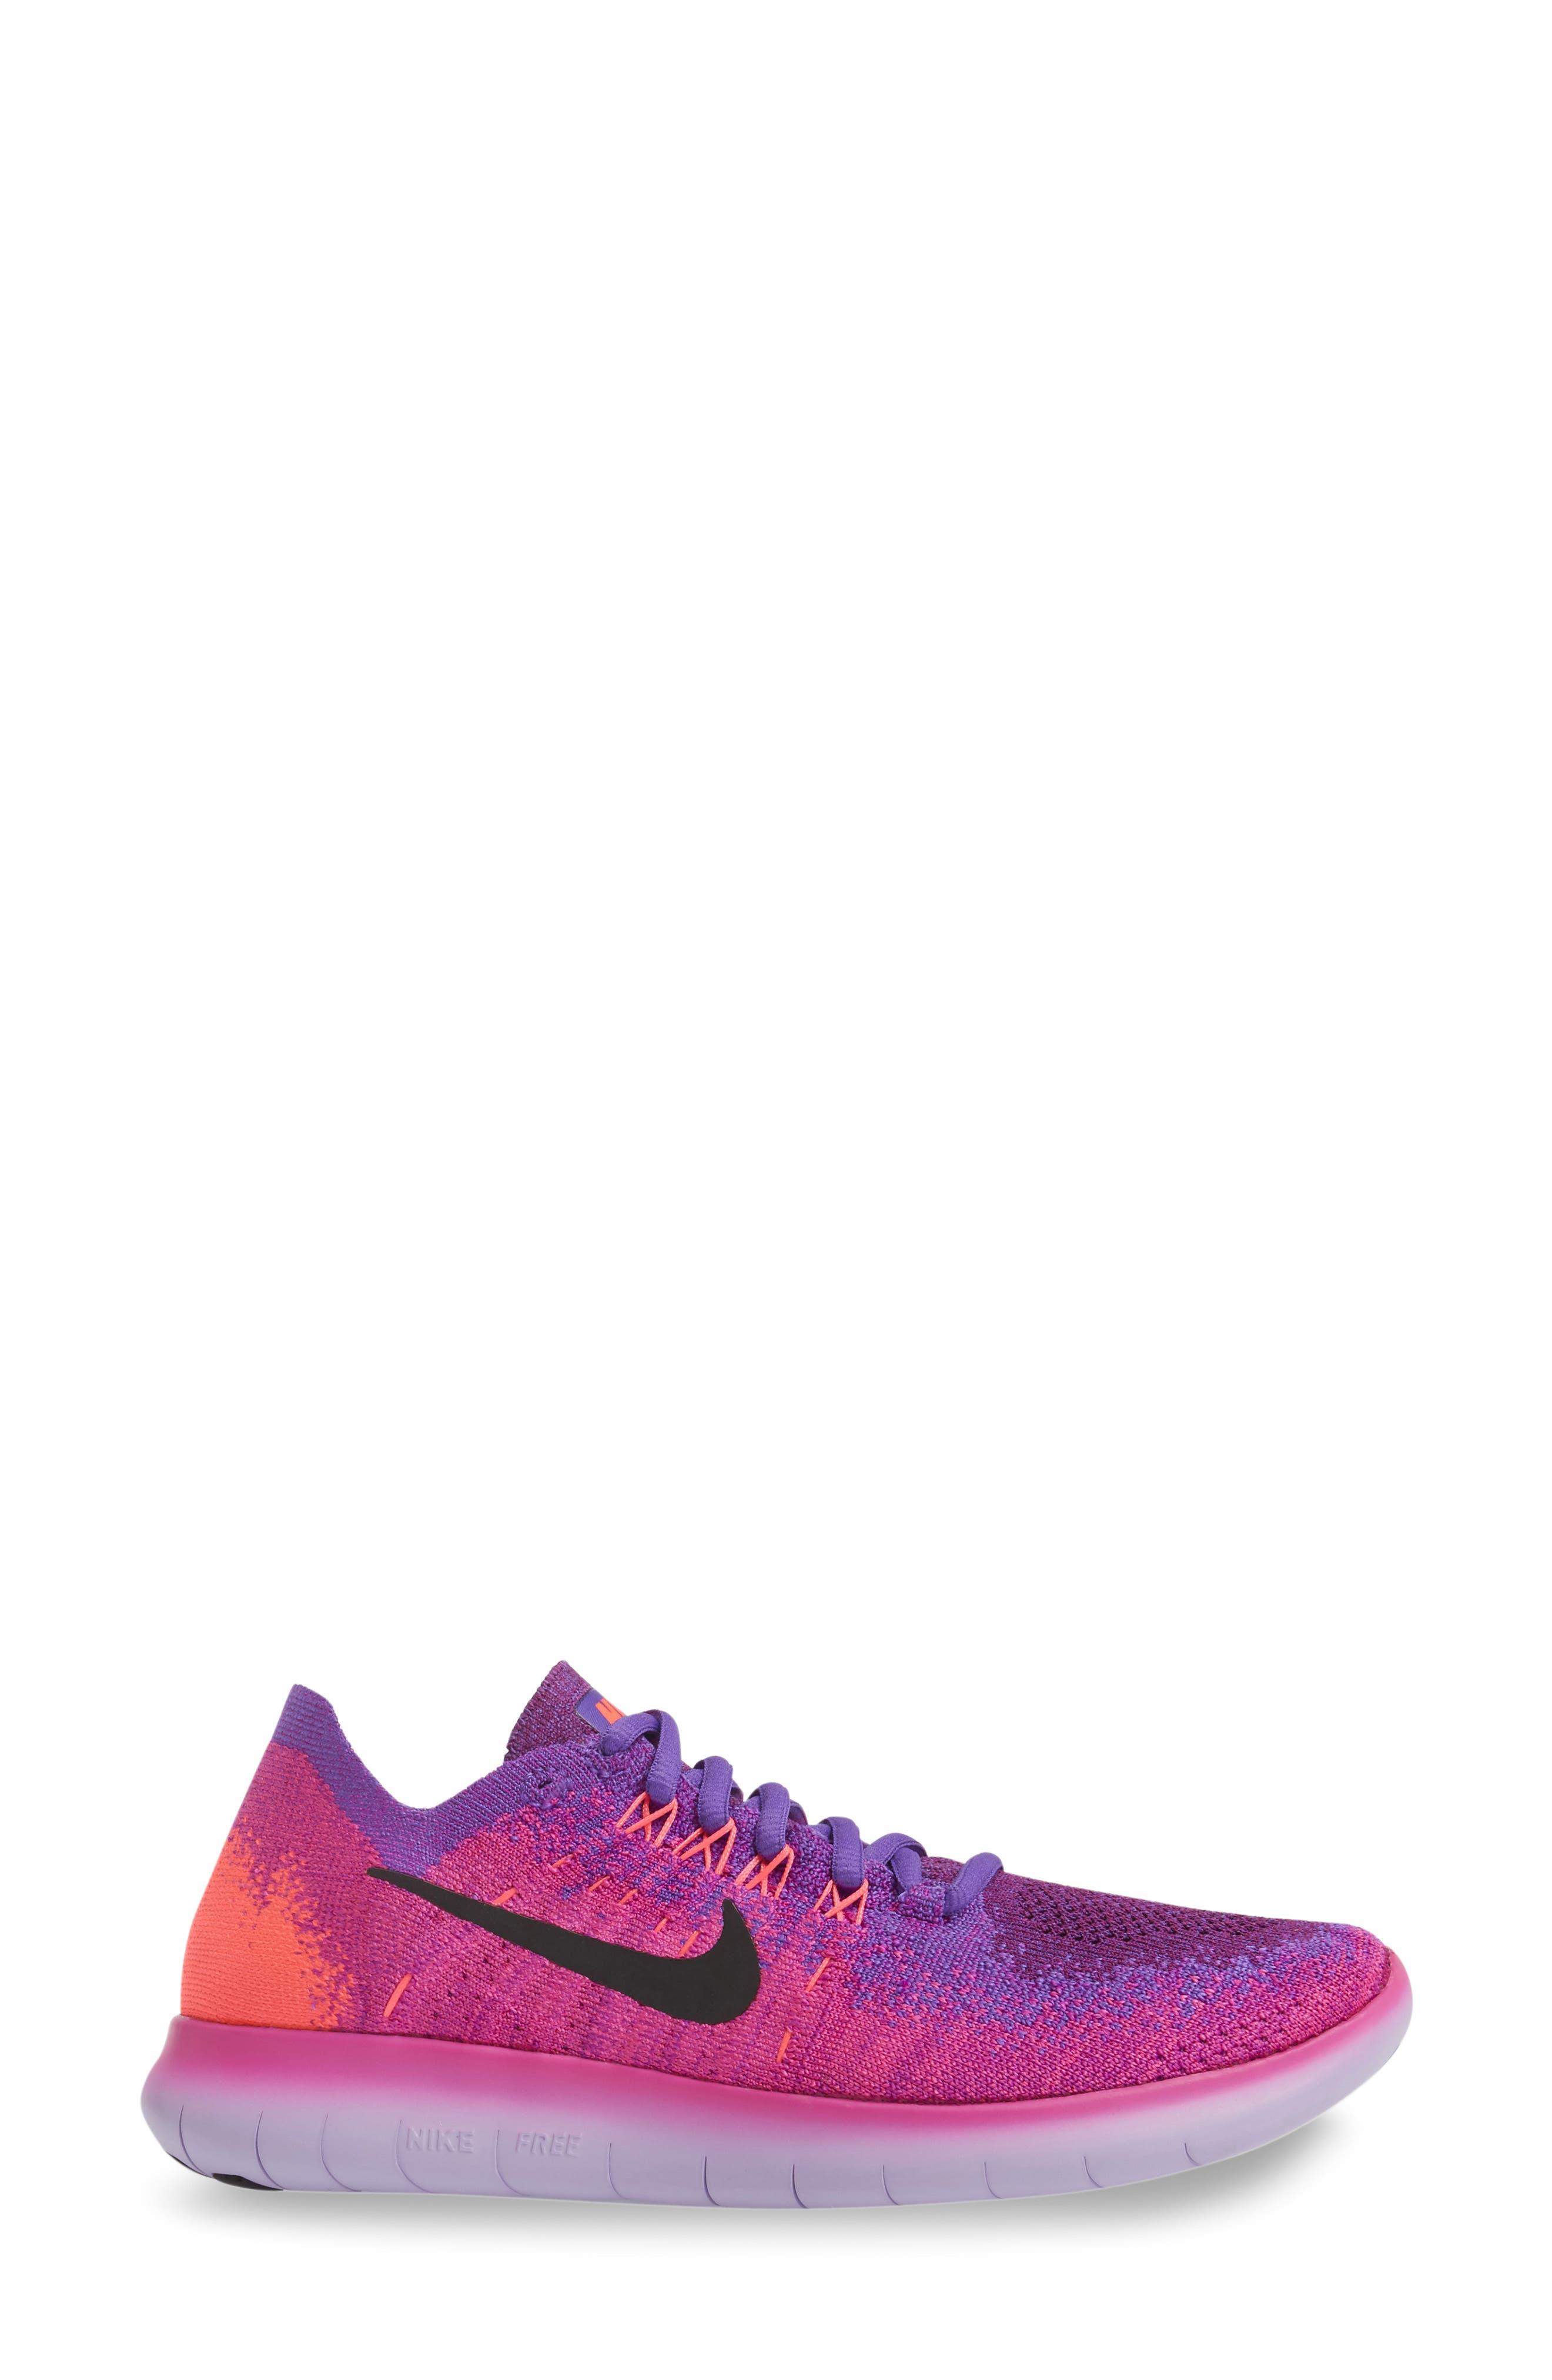 Free RN Flyknit 2 Running Shoe,                             Alternate thumbnail 9, color,